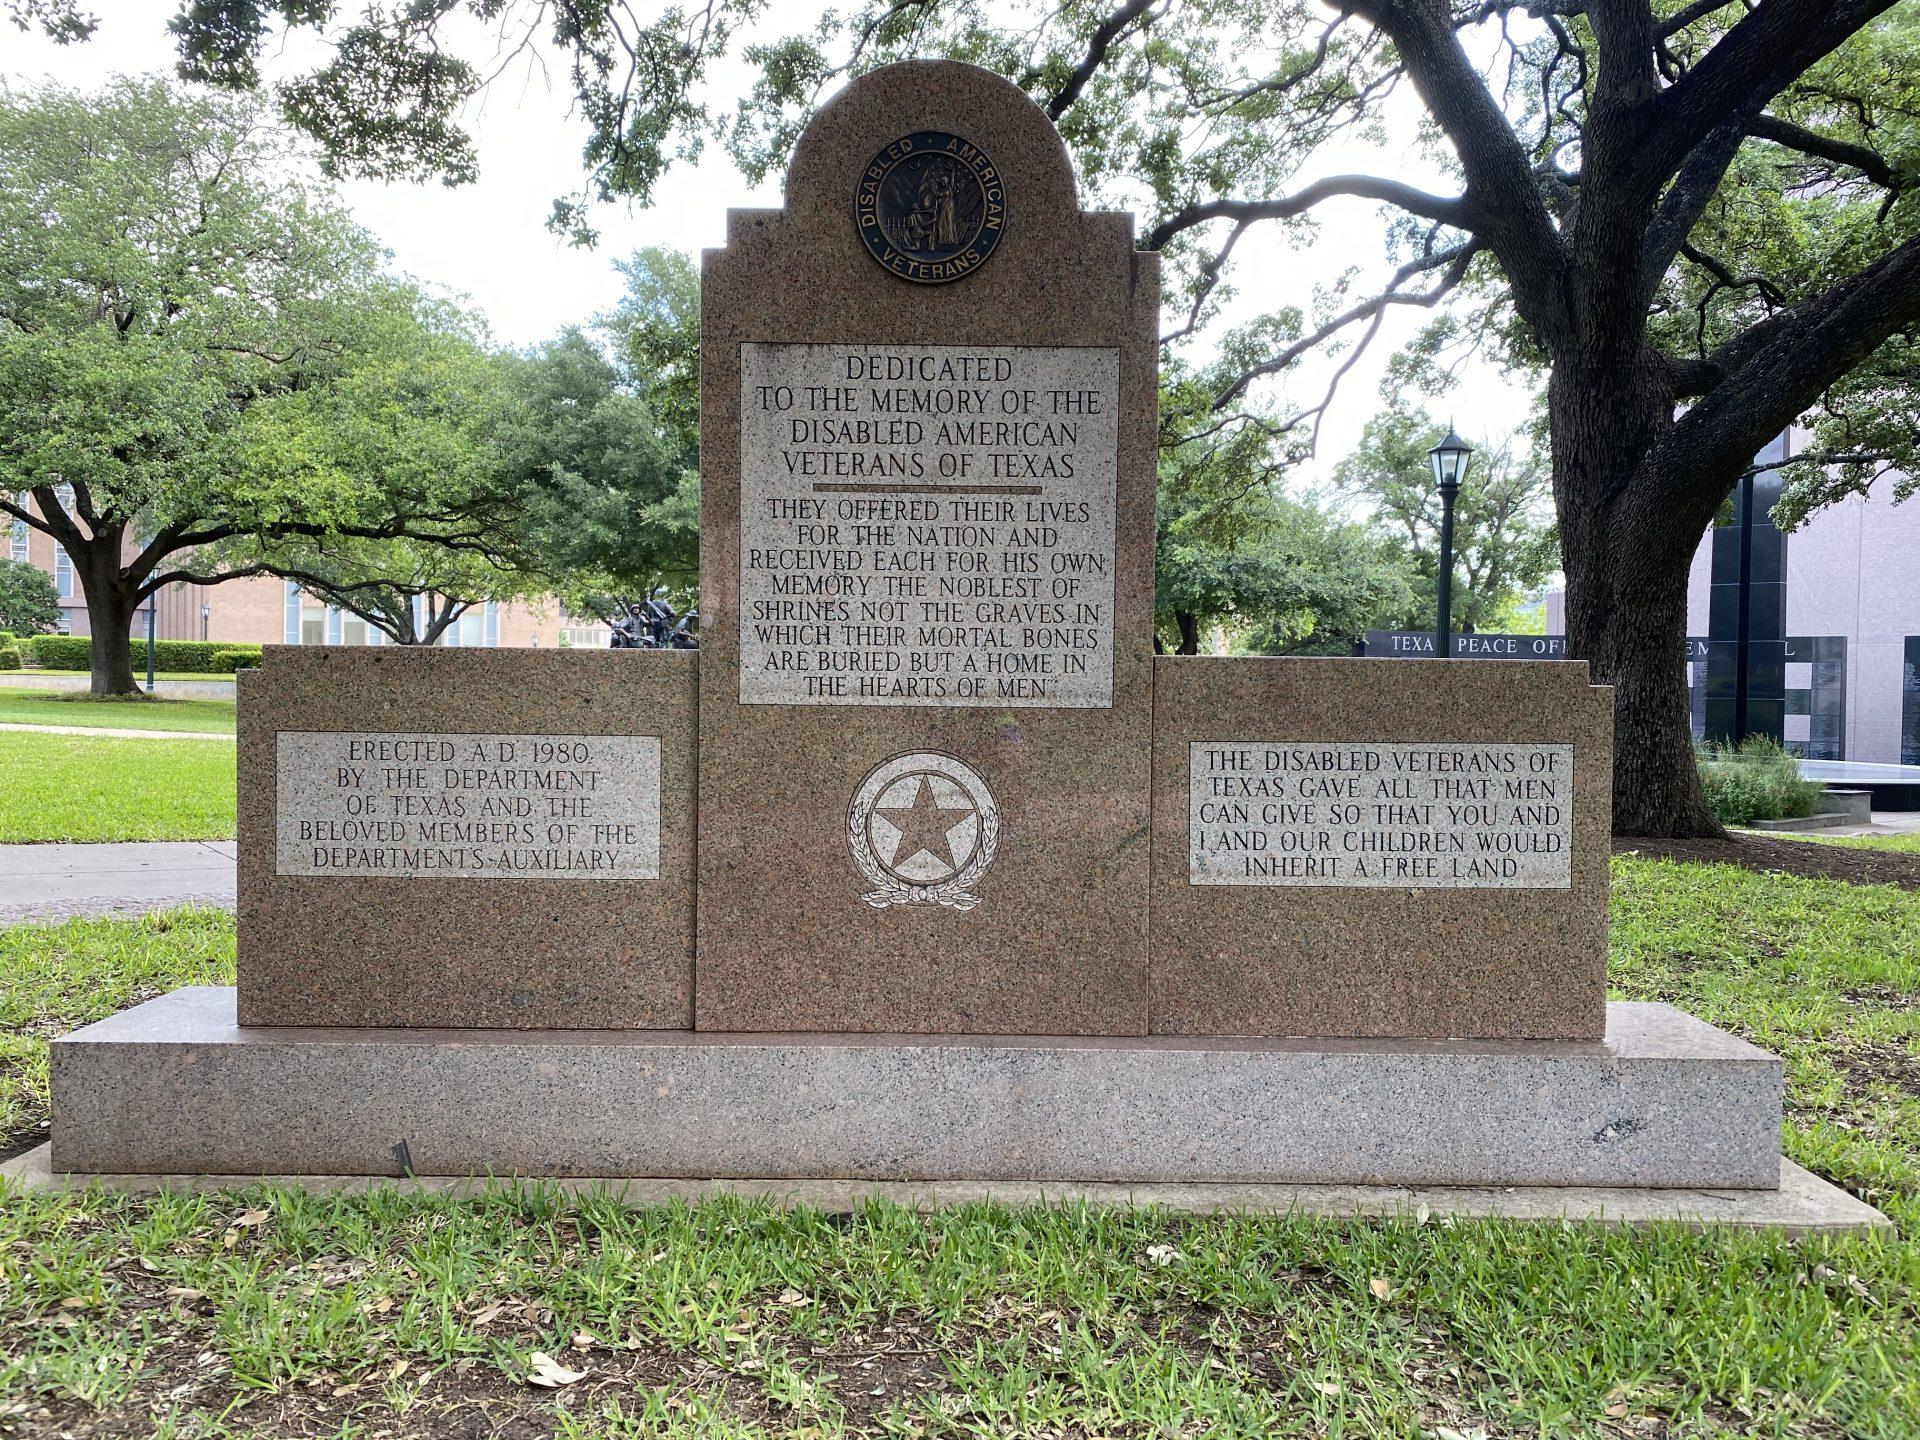 Disabled Texas Veterans memorial at Texas Capitol